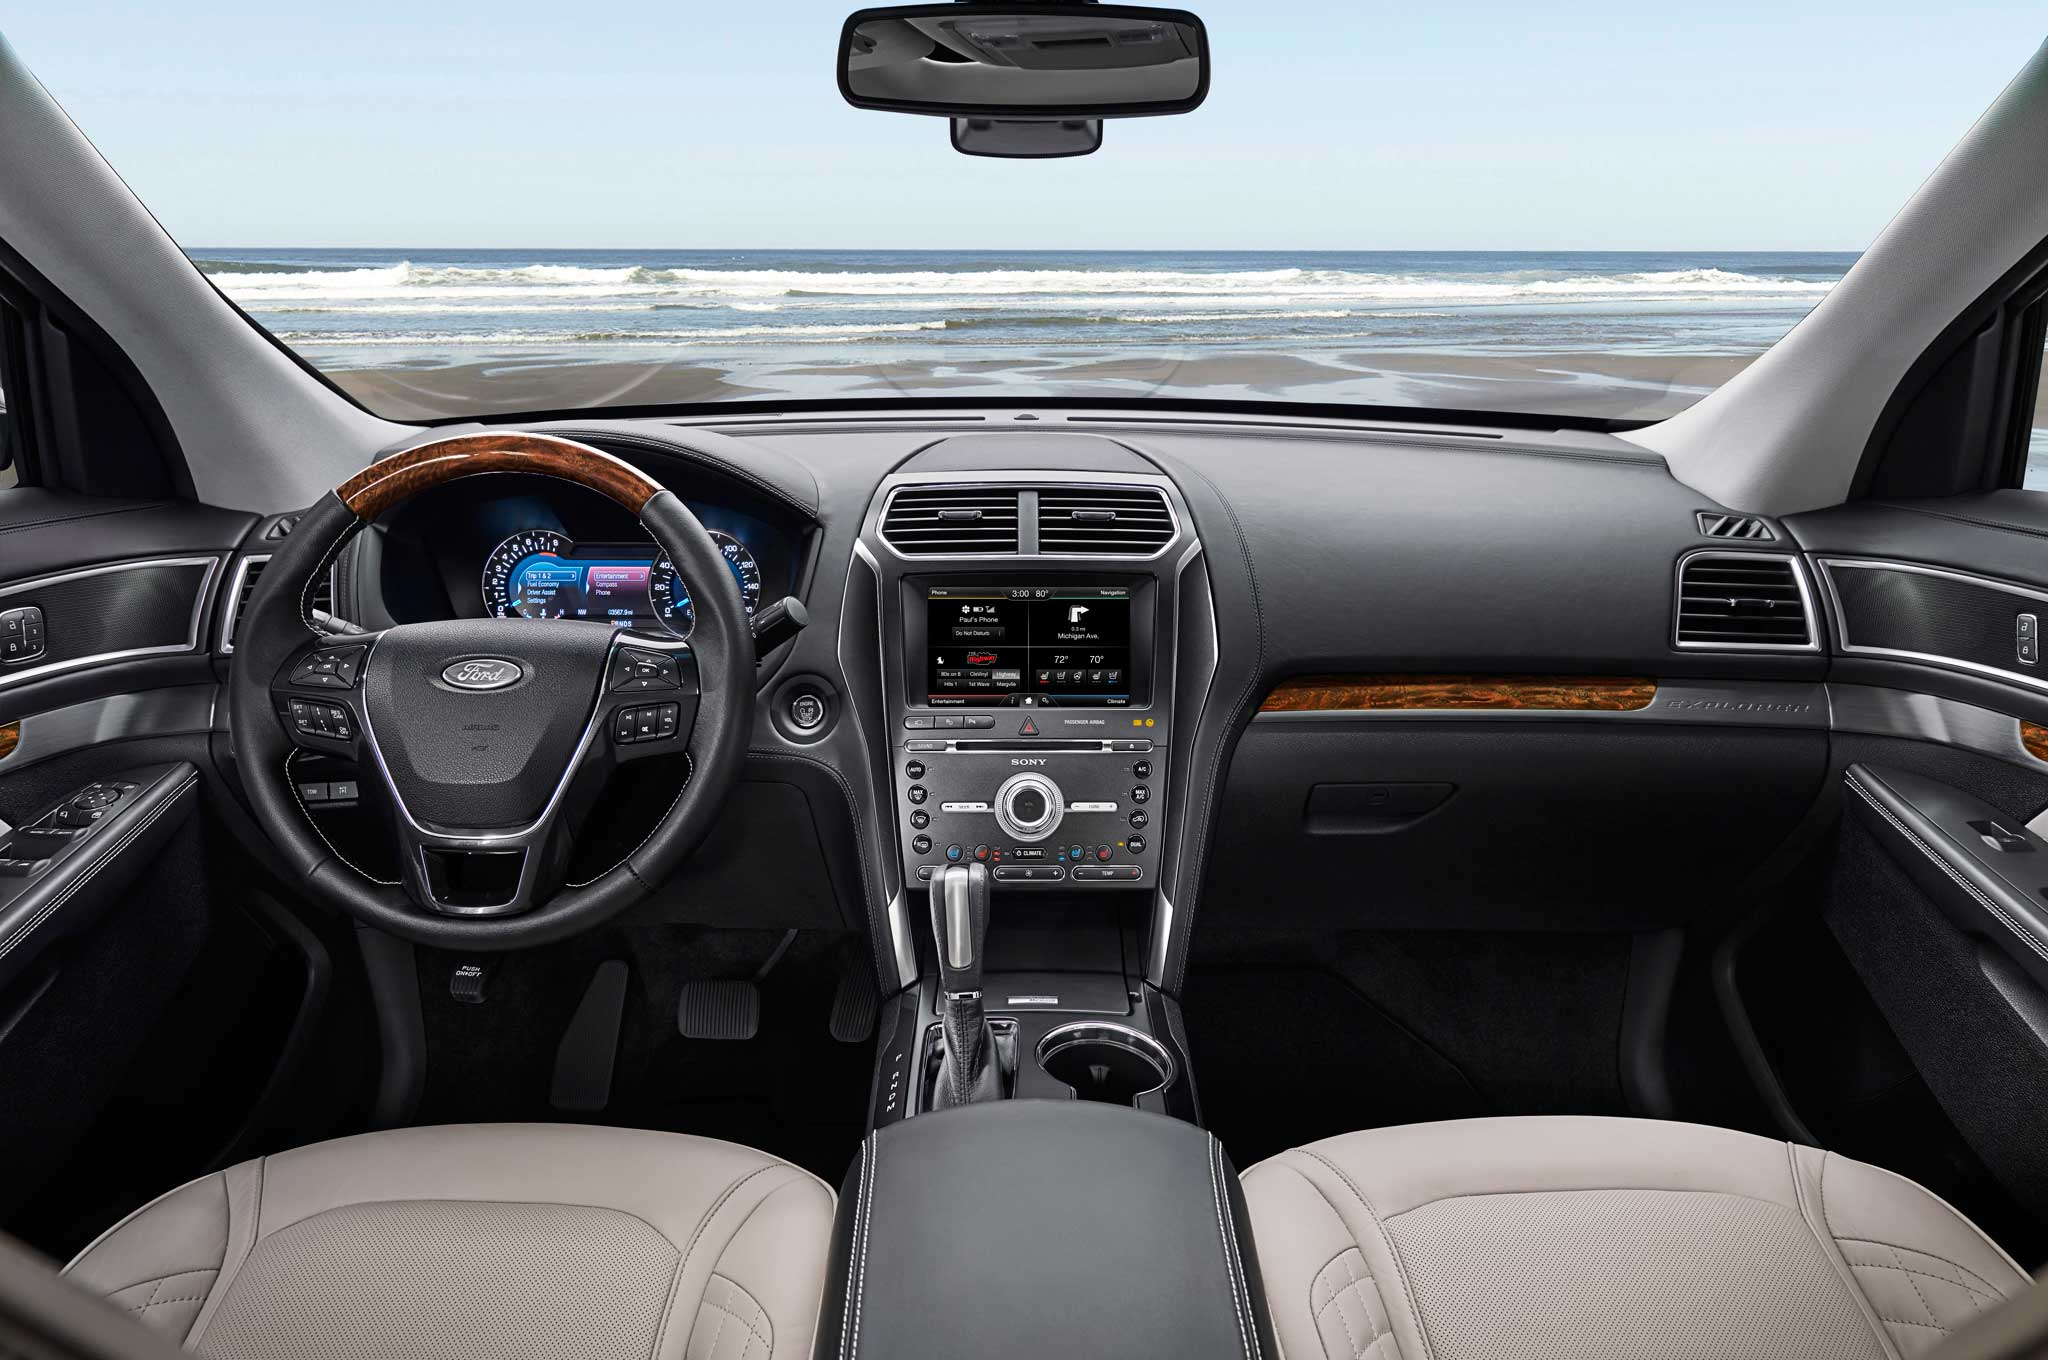 2016-ford-explorer-interior